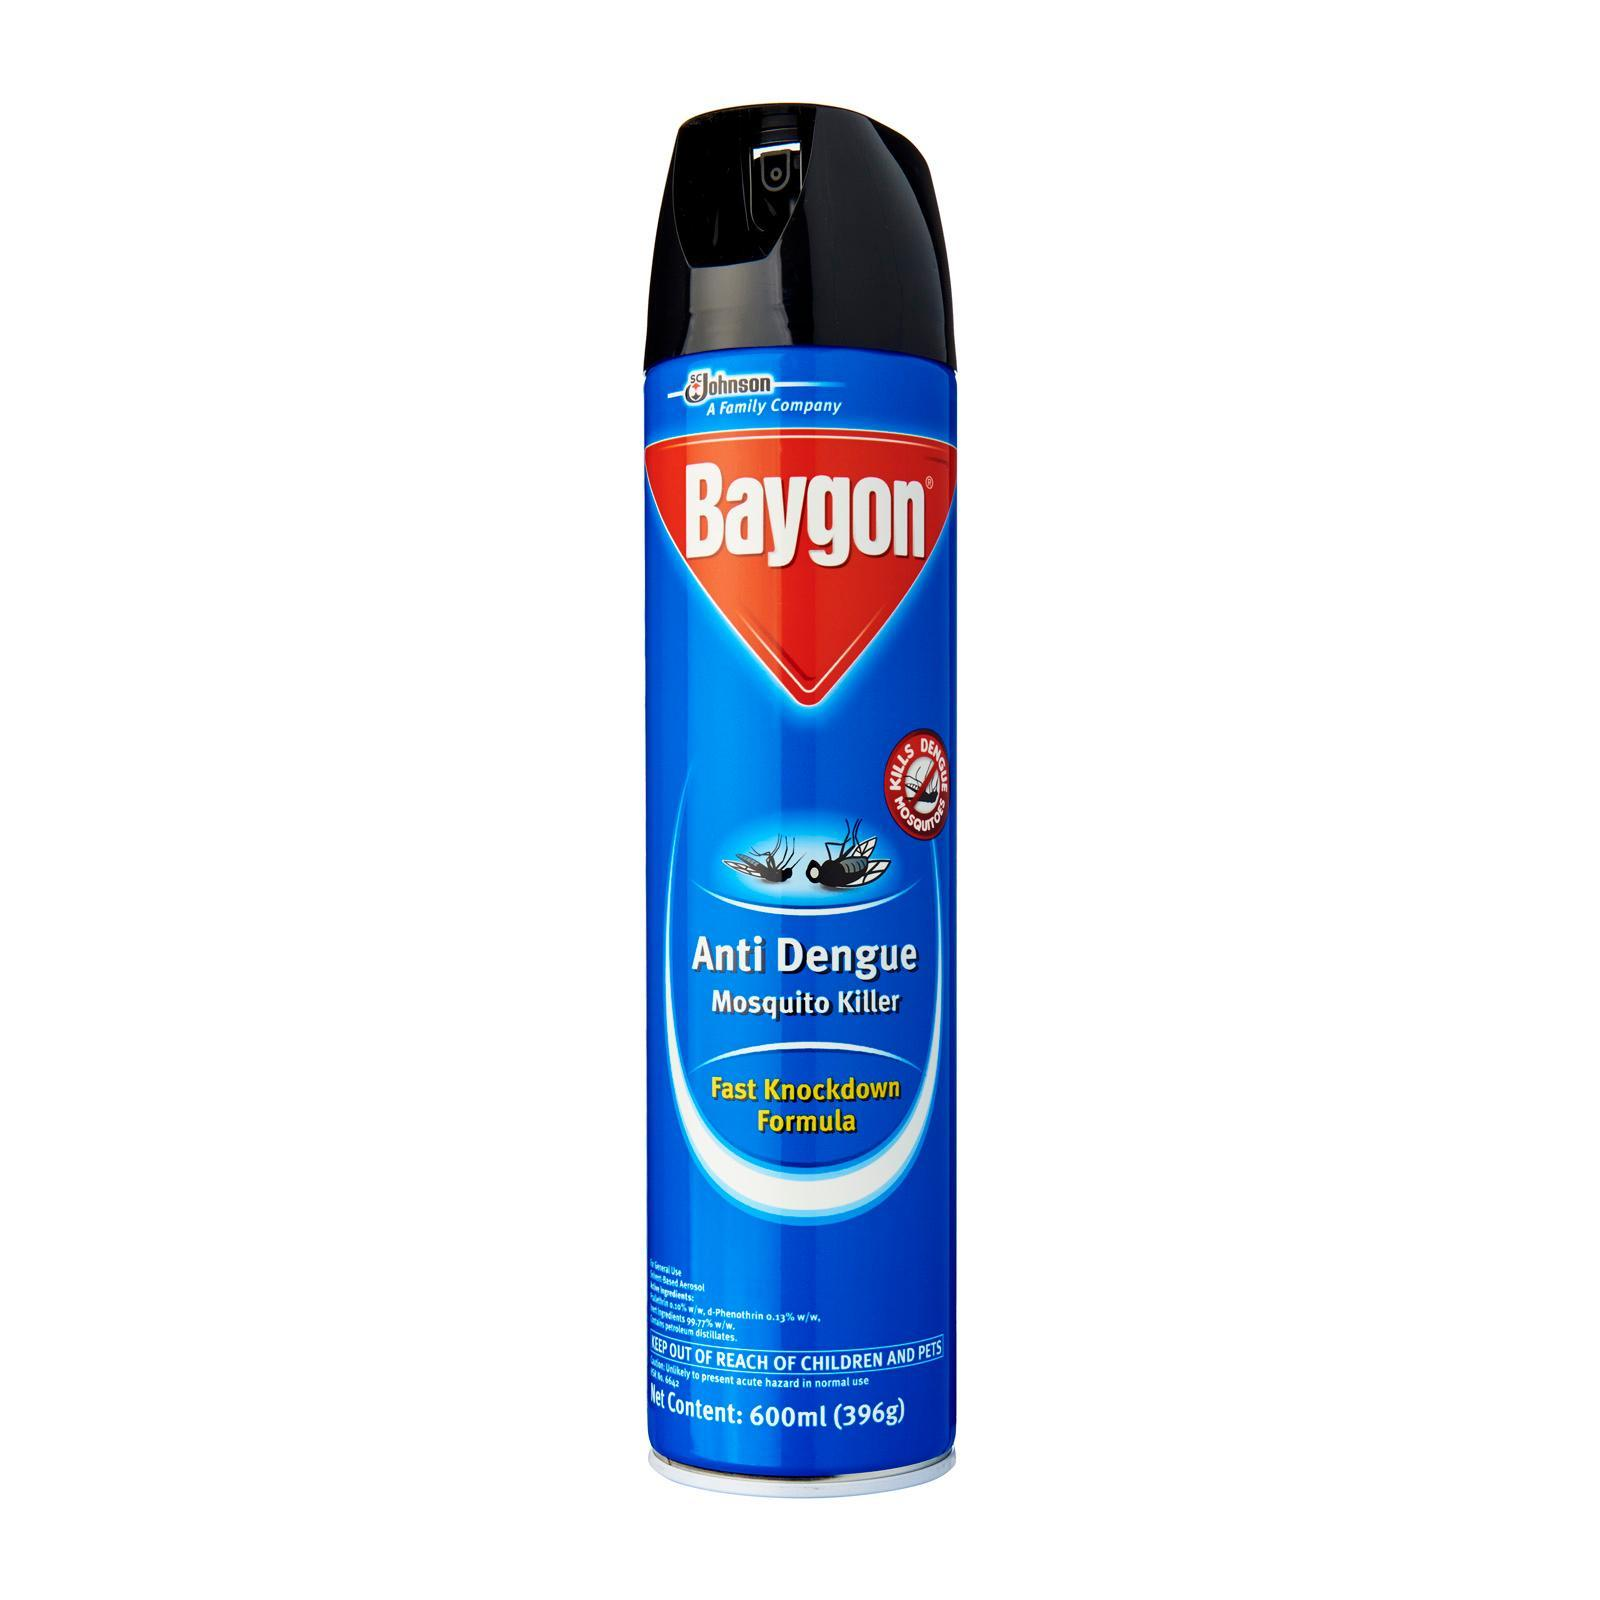 Baygon Anti Dengue Mosquito Killer